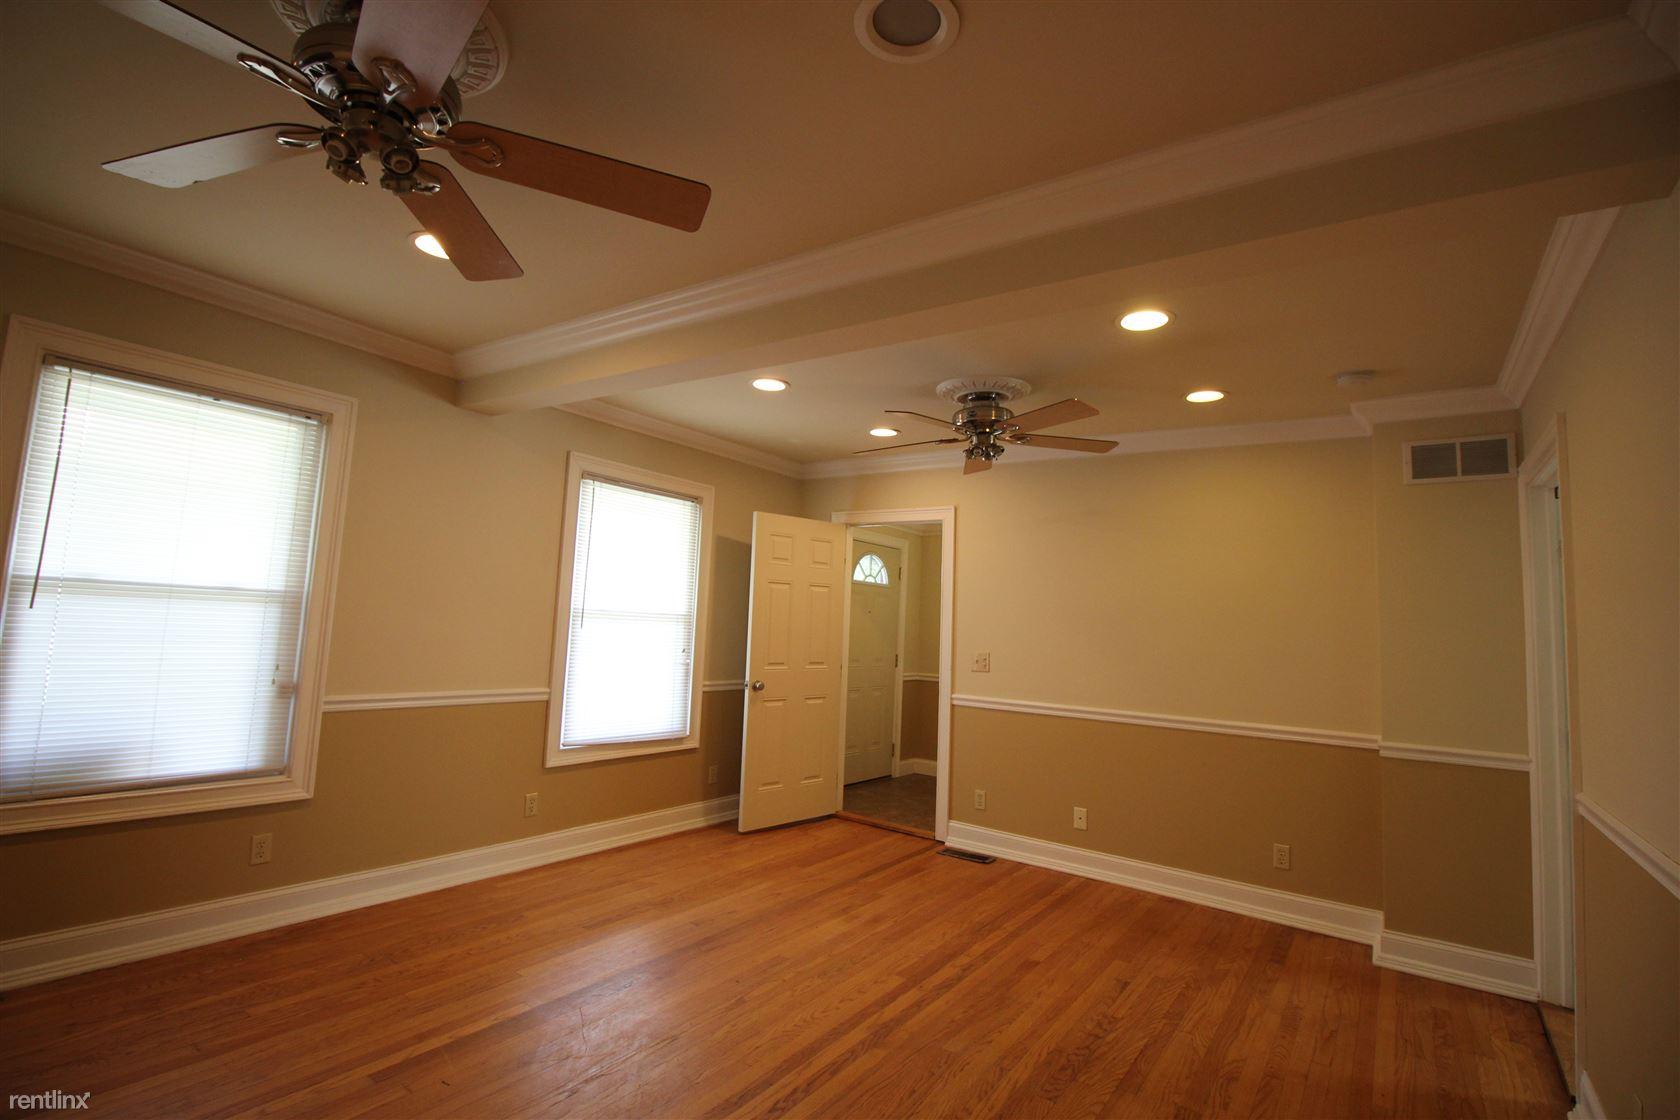 703 Washtenaw Rd, Ypsilanti, MI - $2,994